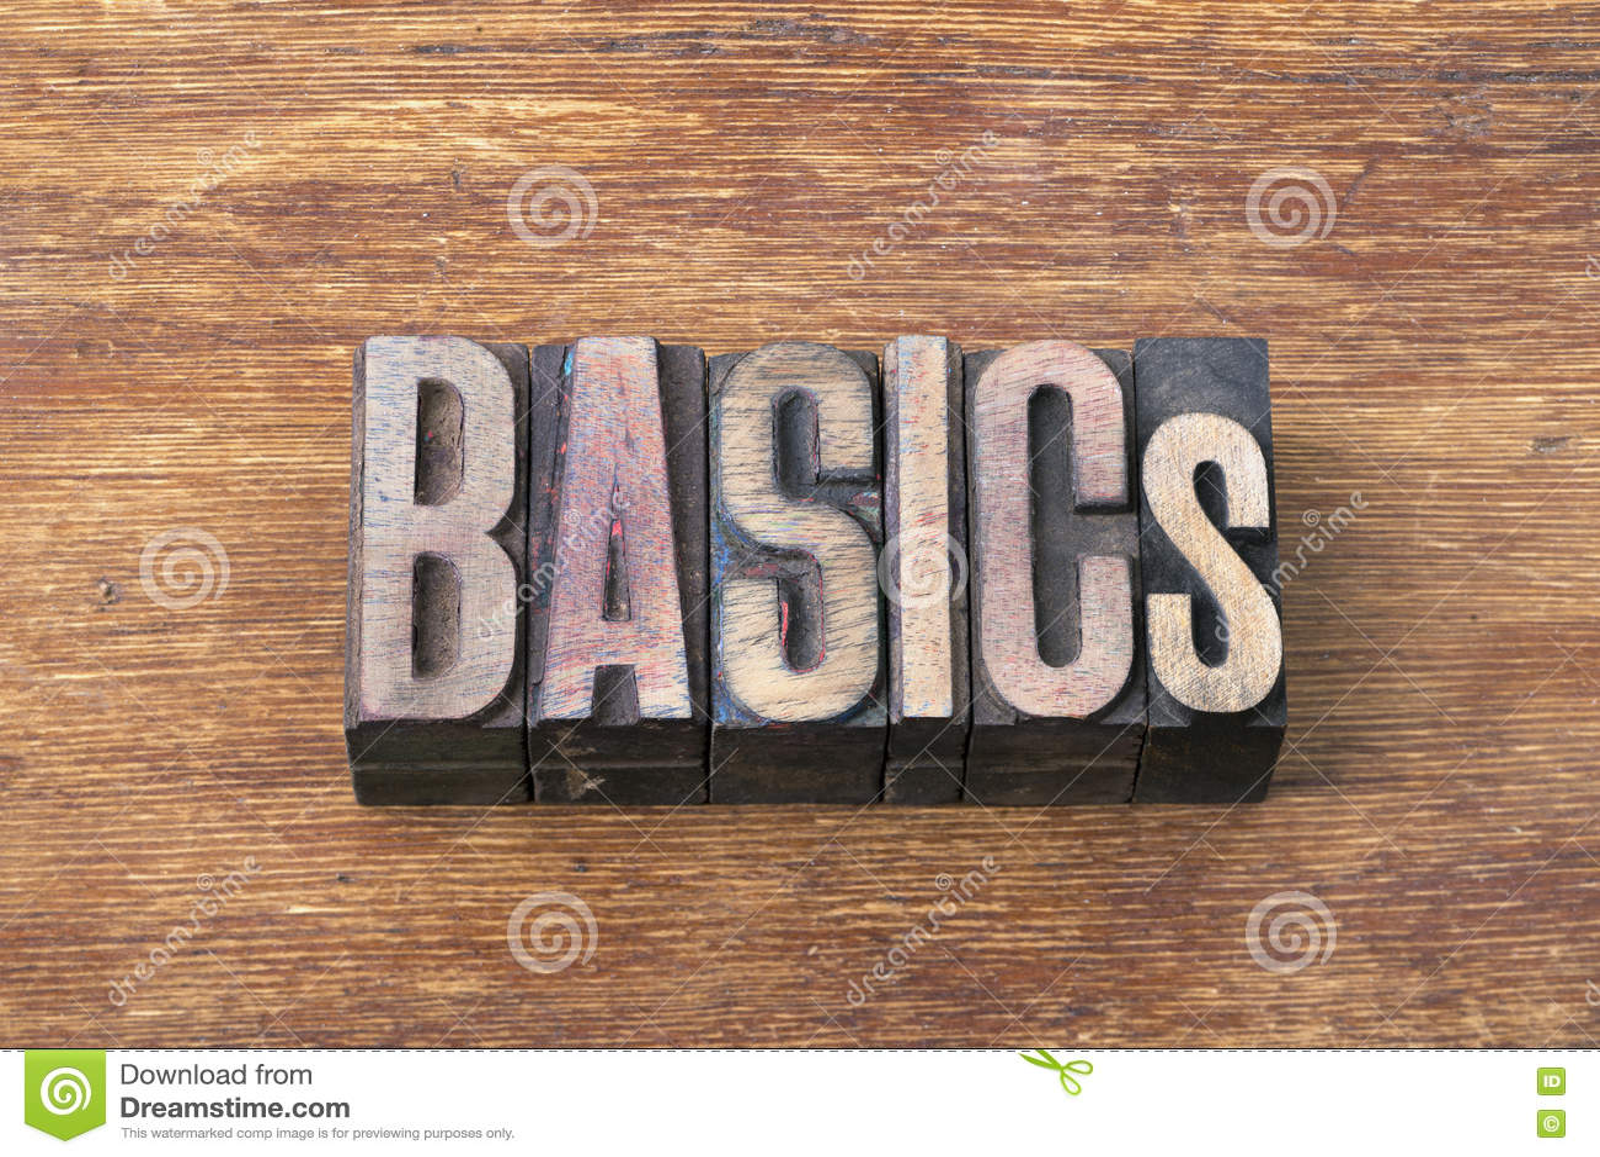 Basics word wood